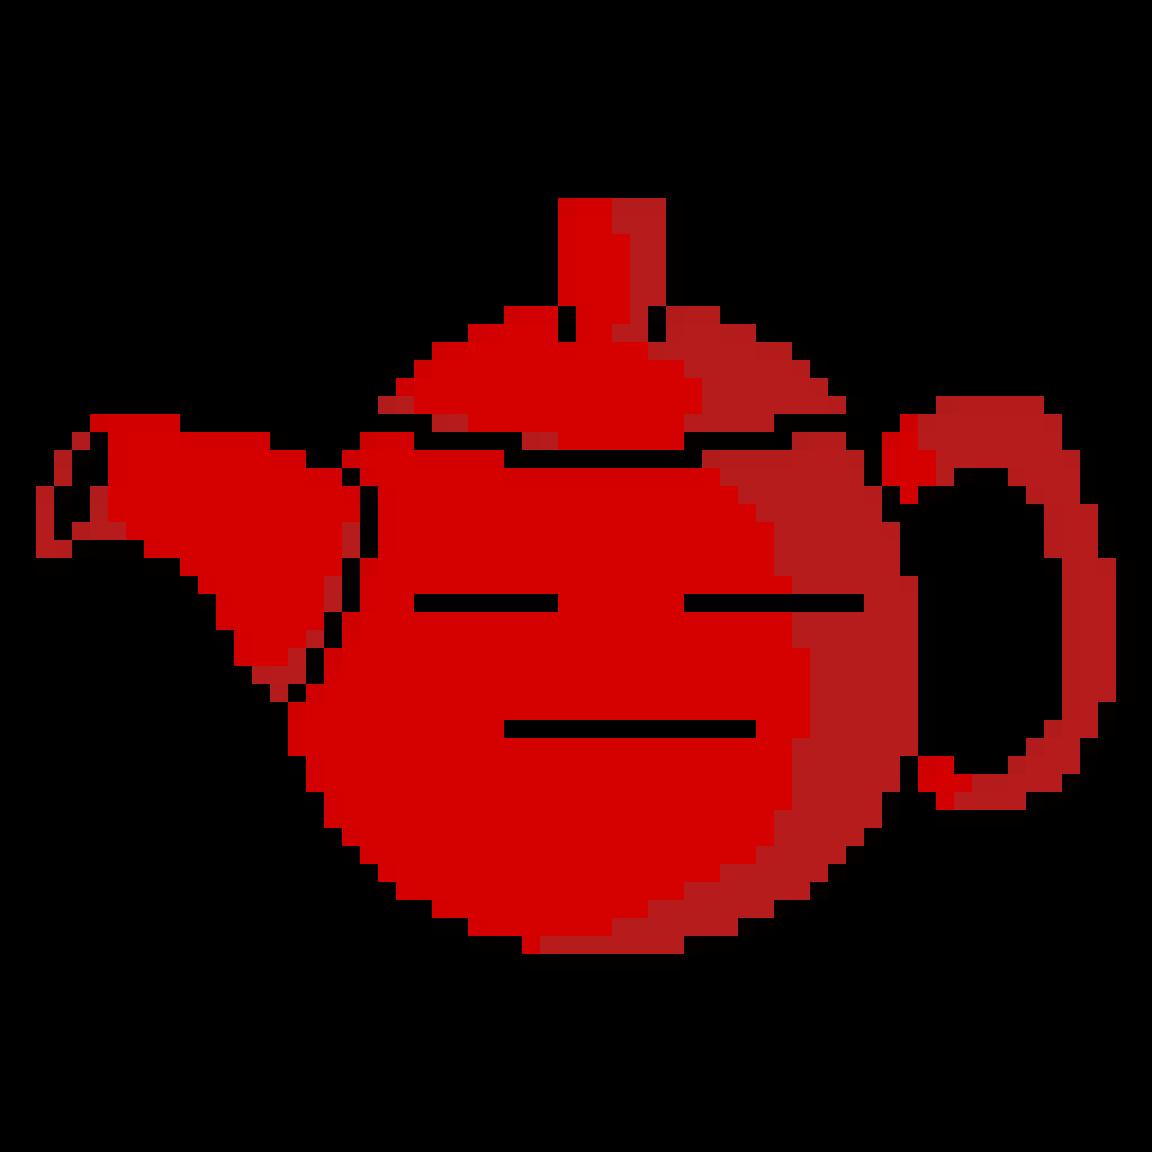 Tea pot says, sub to pewdiepie by MonoandSnow